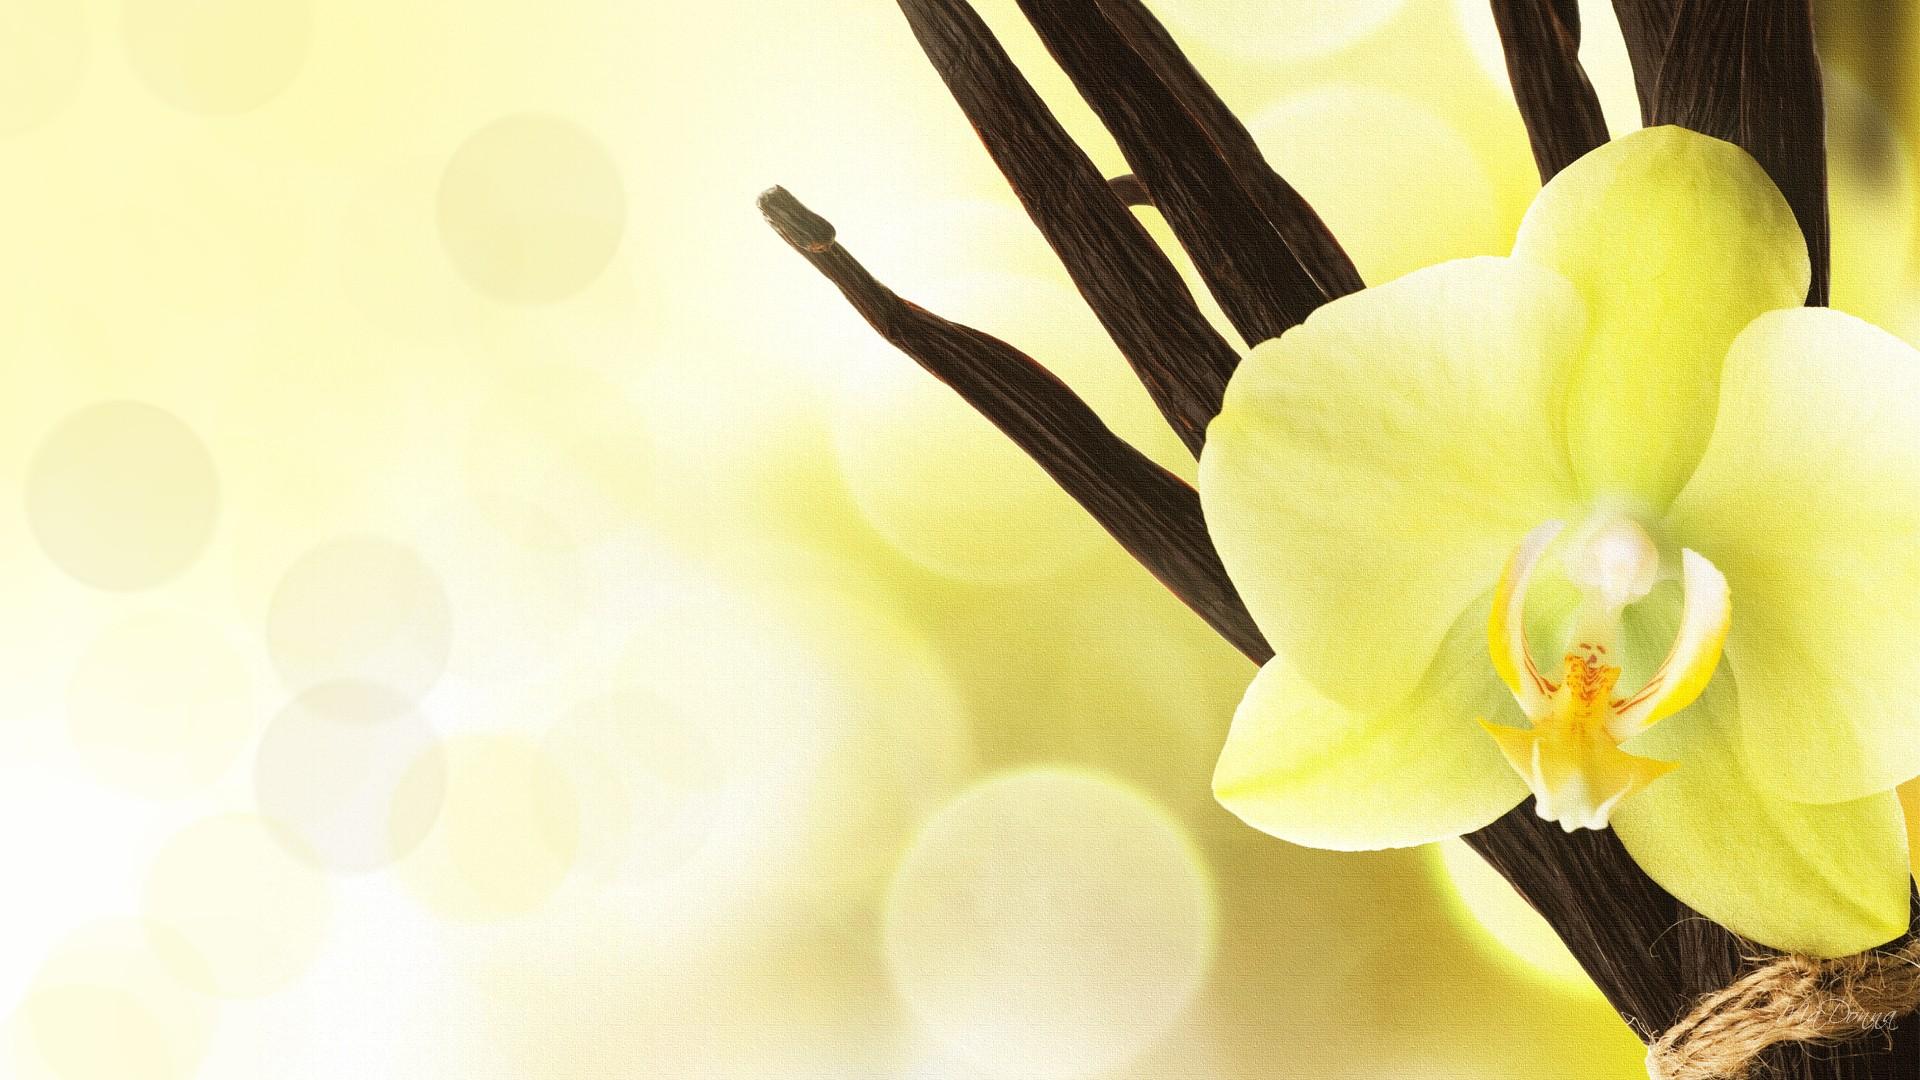 Orchids wallpaper wallpapersafari - White orchid flowers desktop wallpapers ...